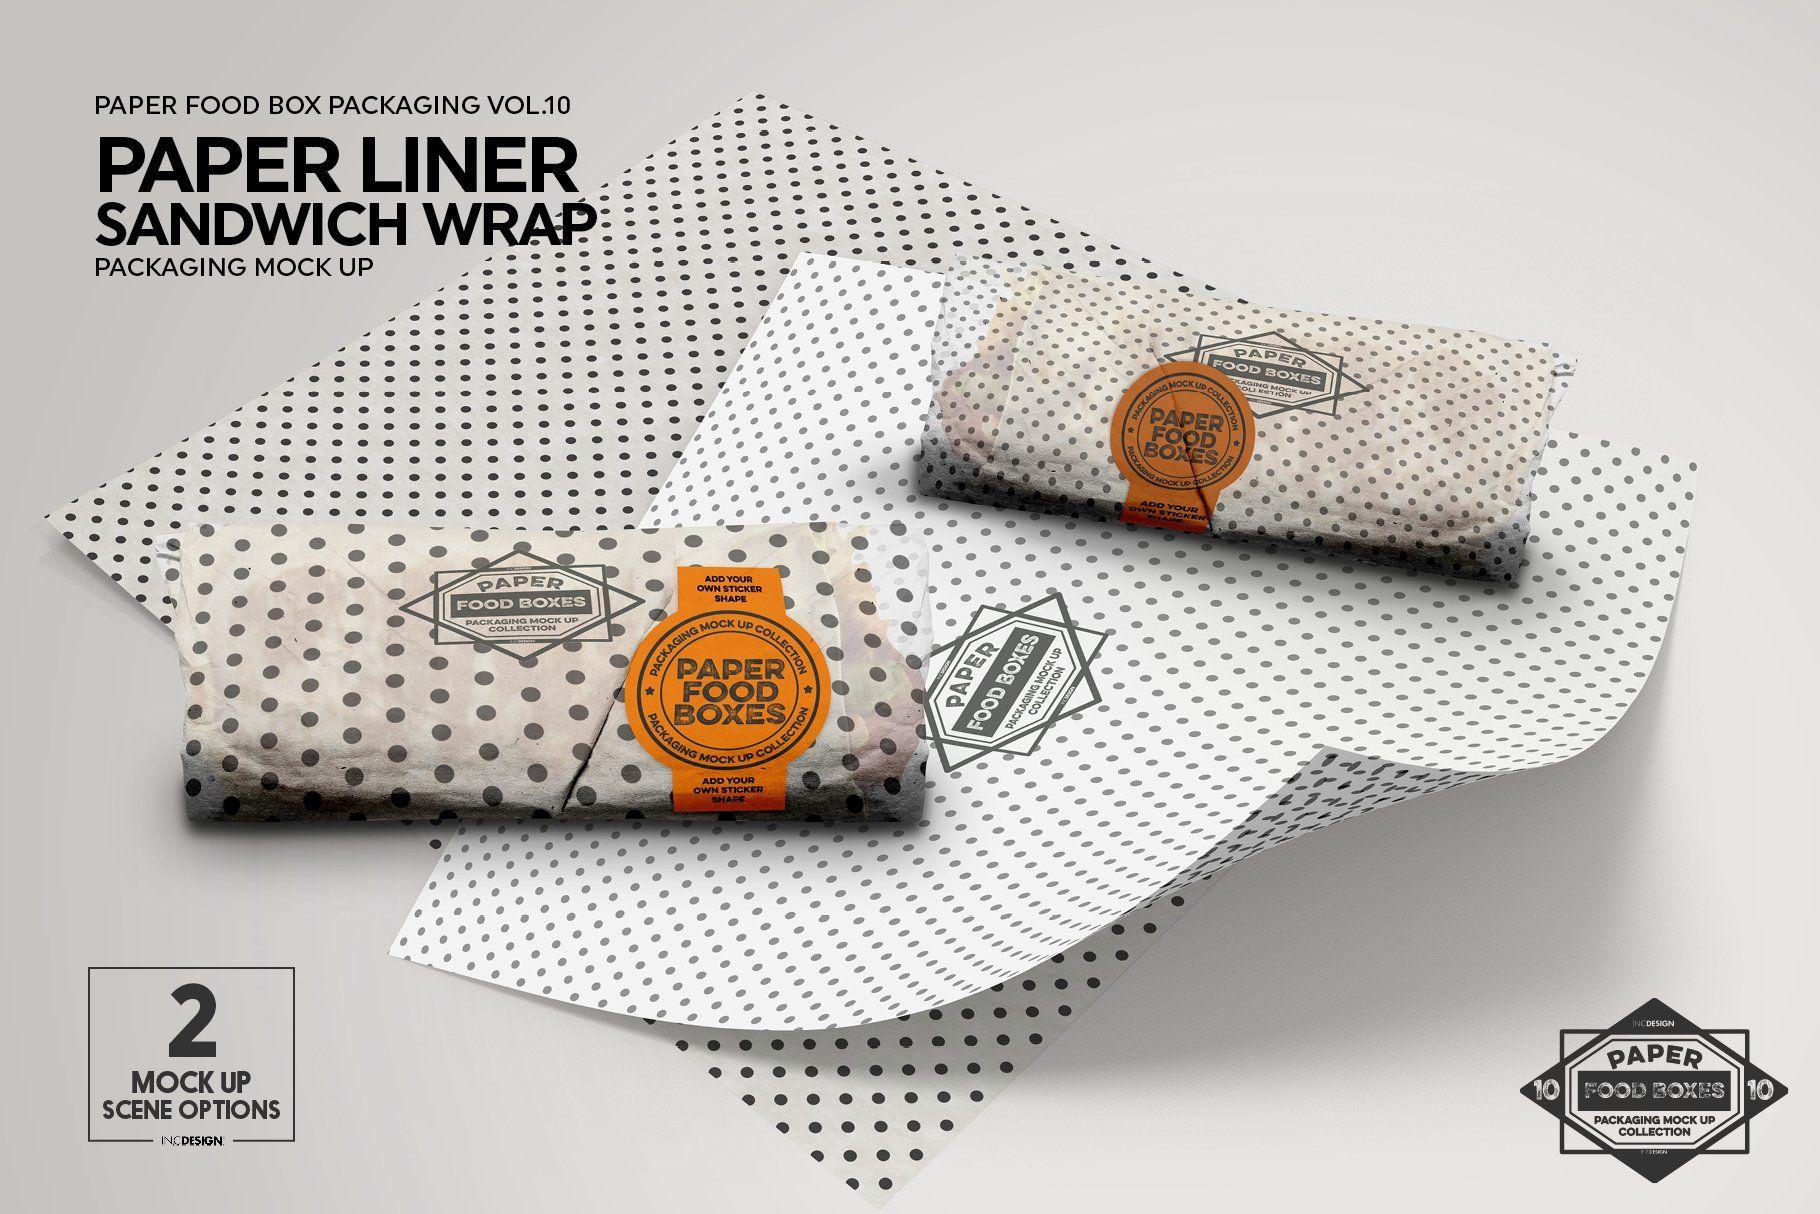 Wrap Or Burrito Paper Liner Mockup Paper Liner Free Packaging Mockup Food Box Packaging